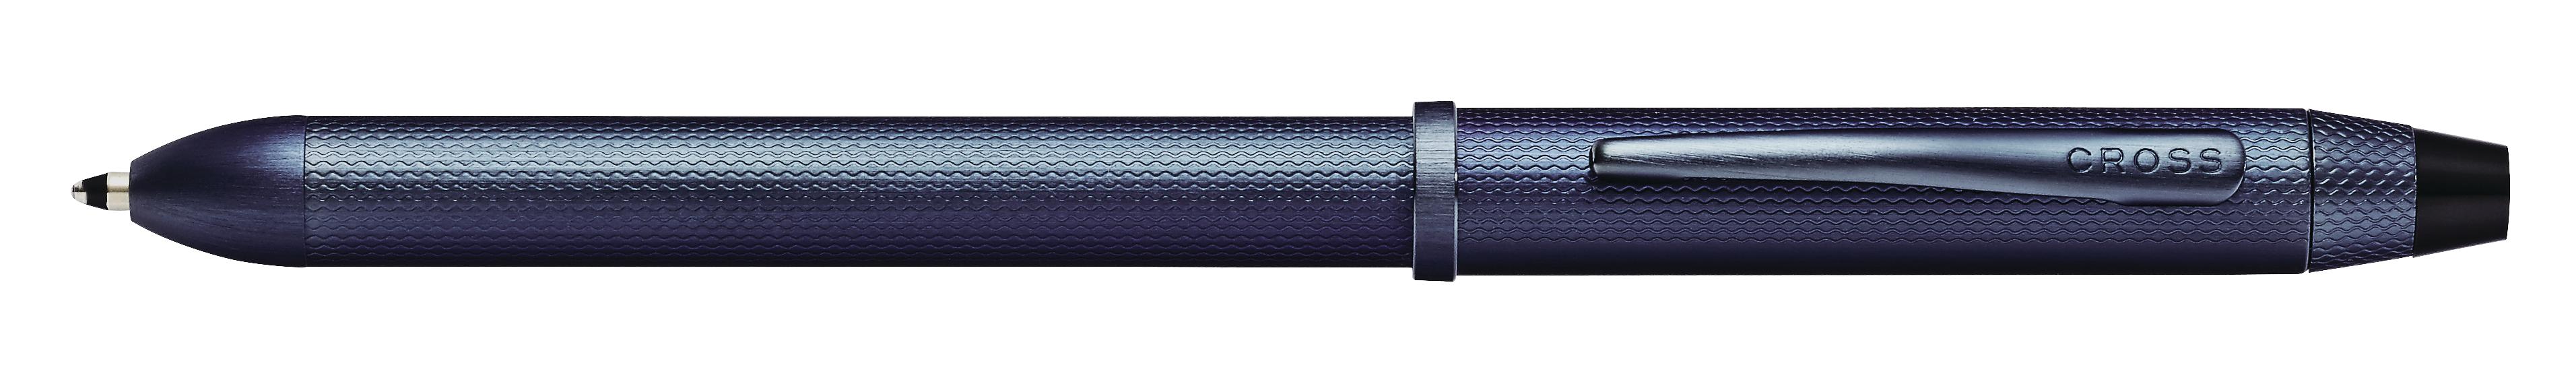 Tech3+ Dark Blue PVD Multifunction Pen